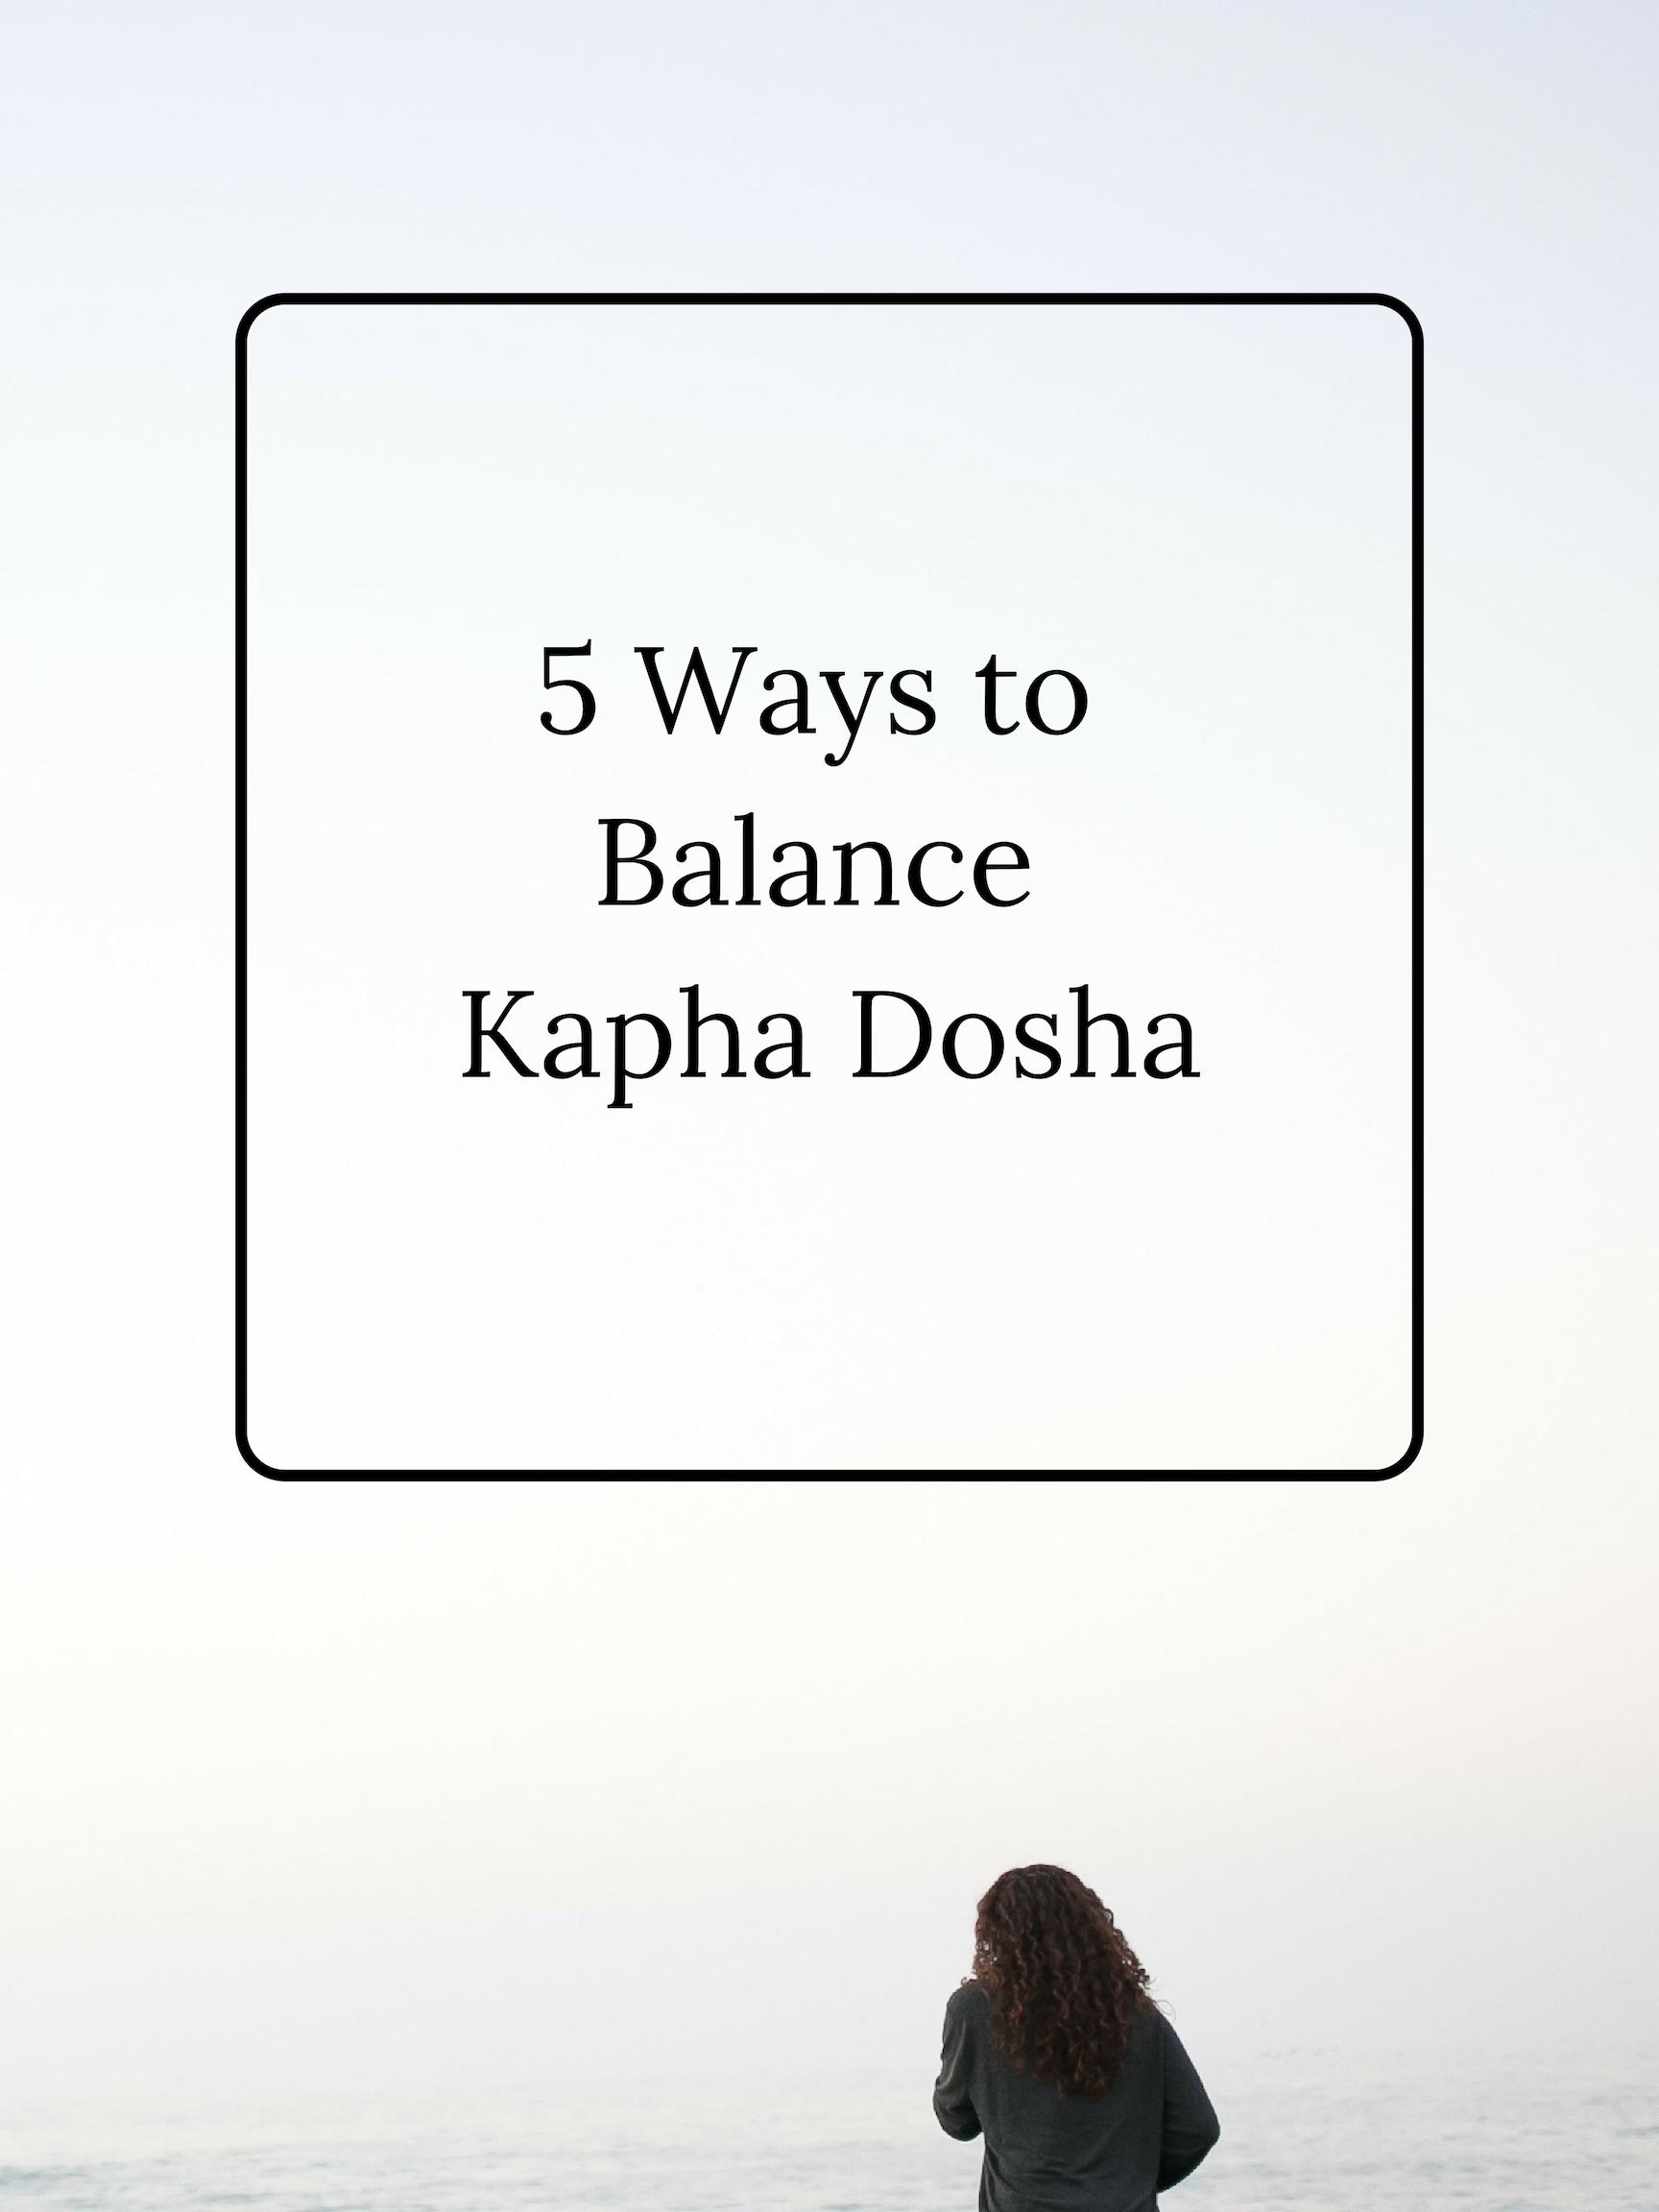 5 Ways to Balance Kapha Dosha.jpg